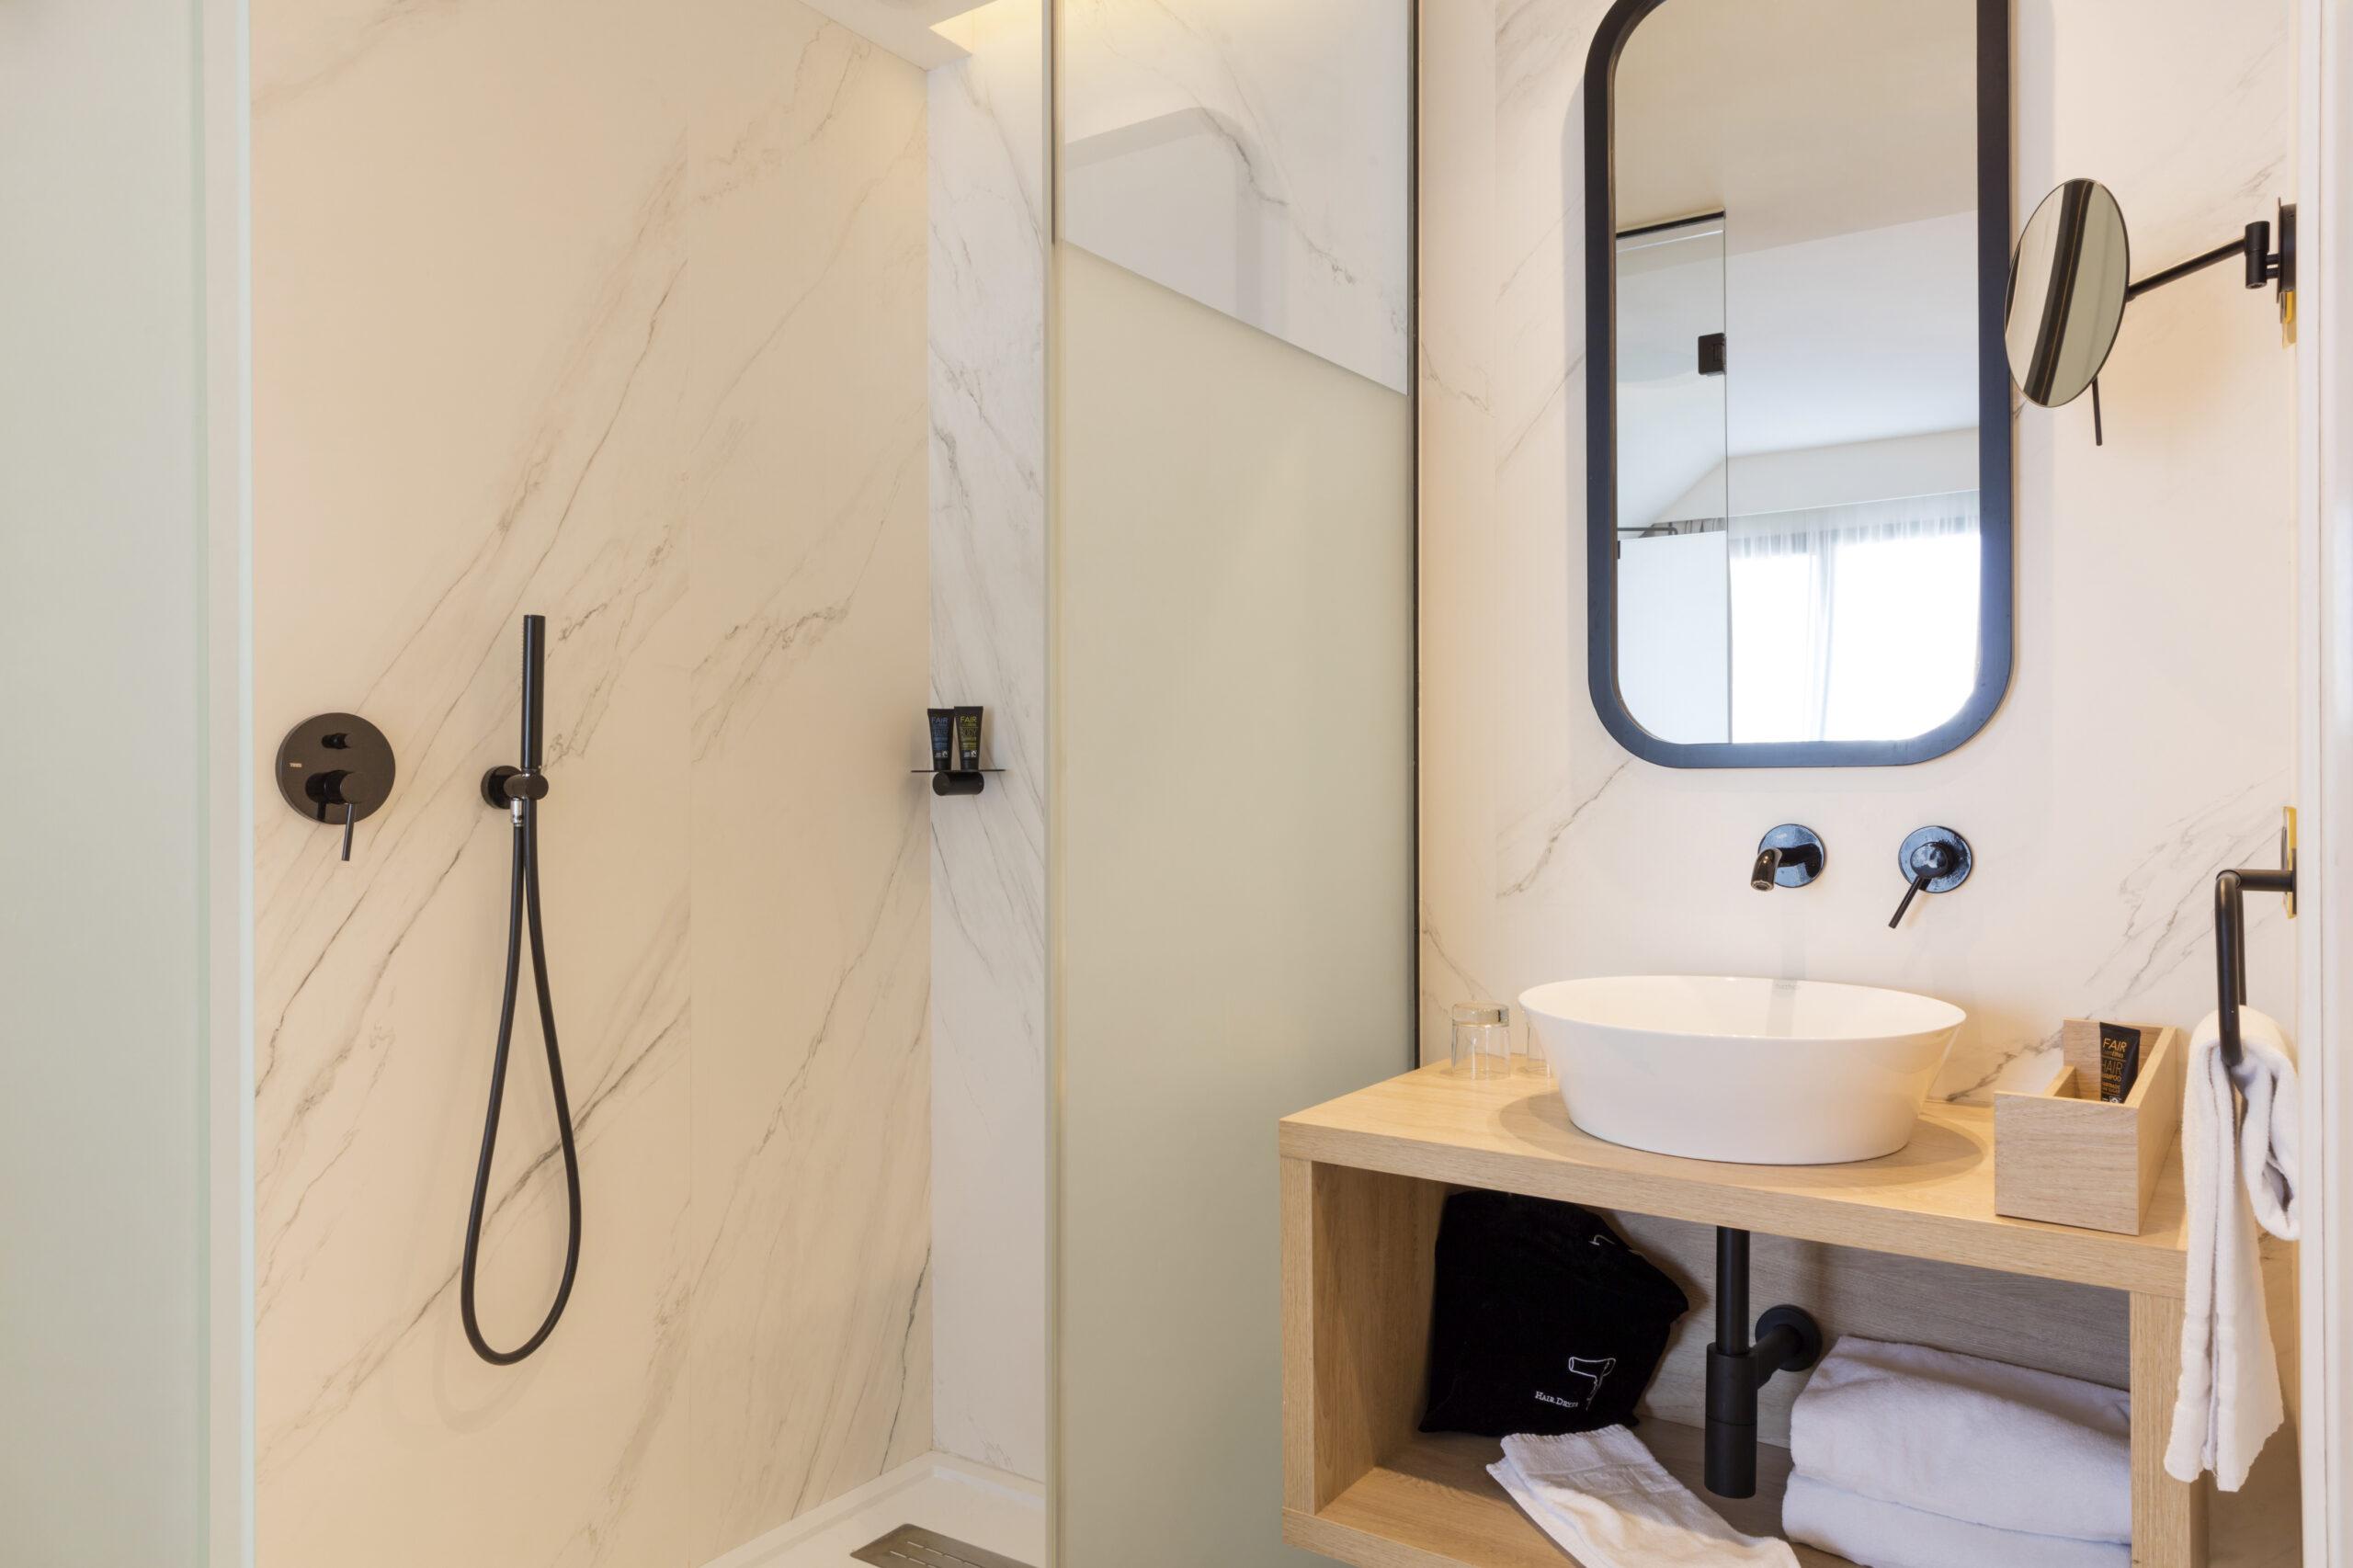 Ars Magna Bleisure Hotel - Camera doppia standard - Servizi